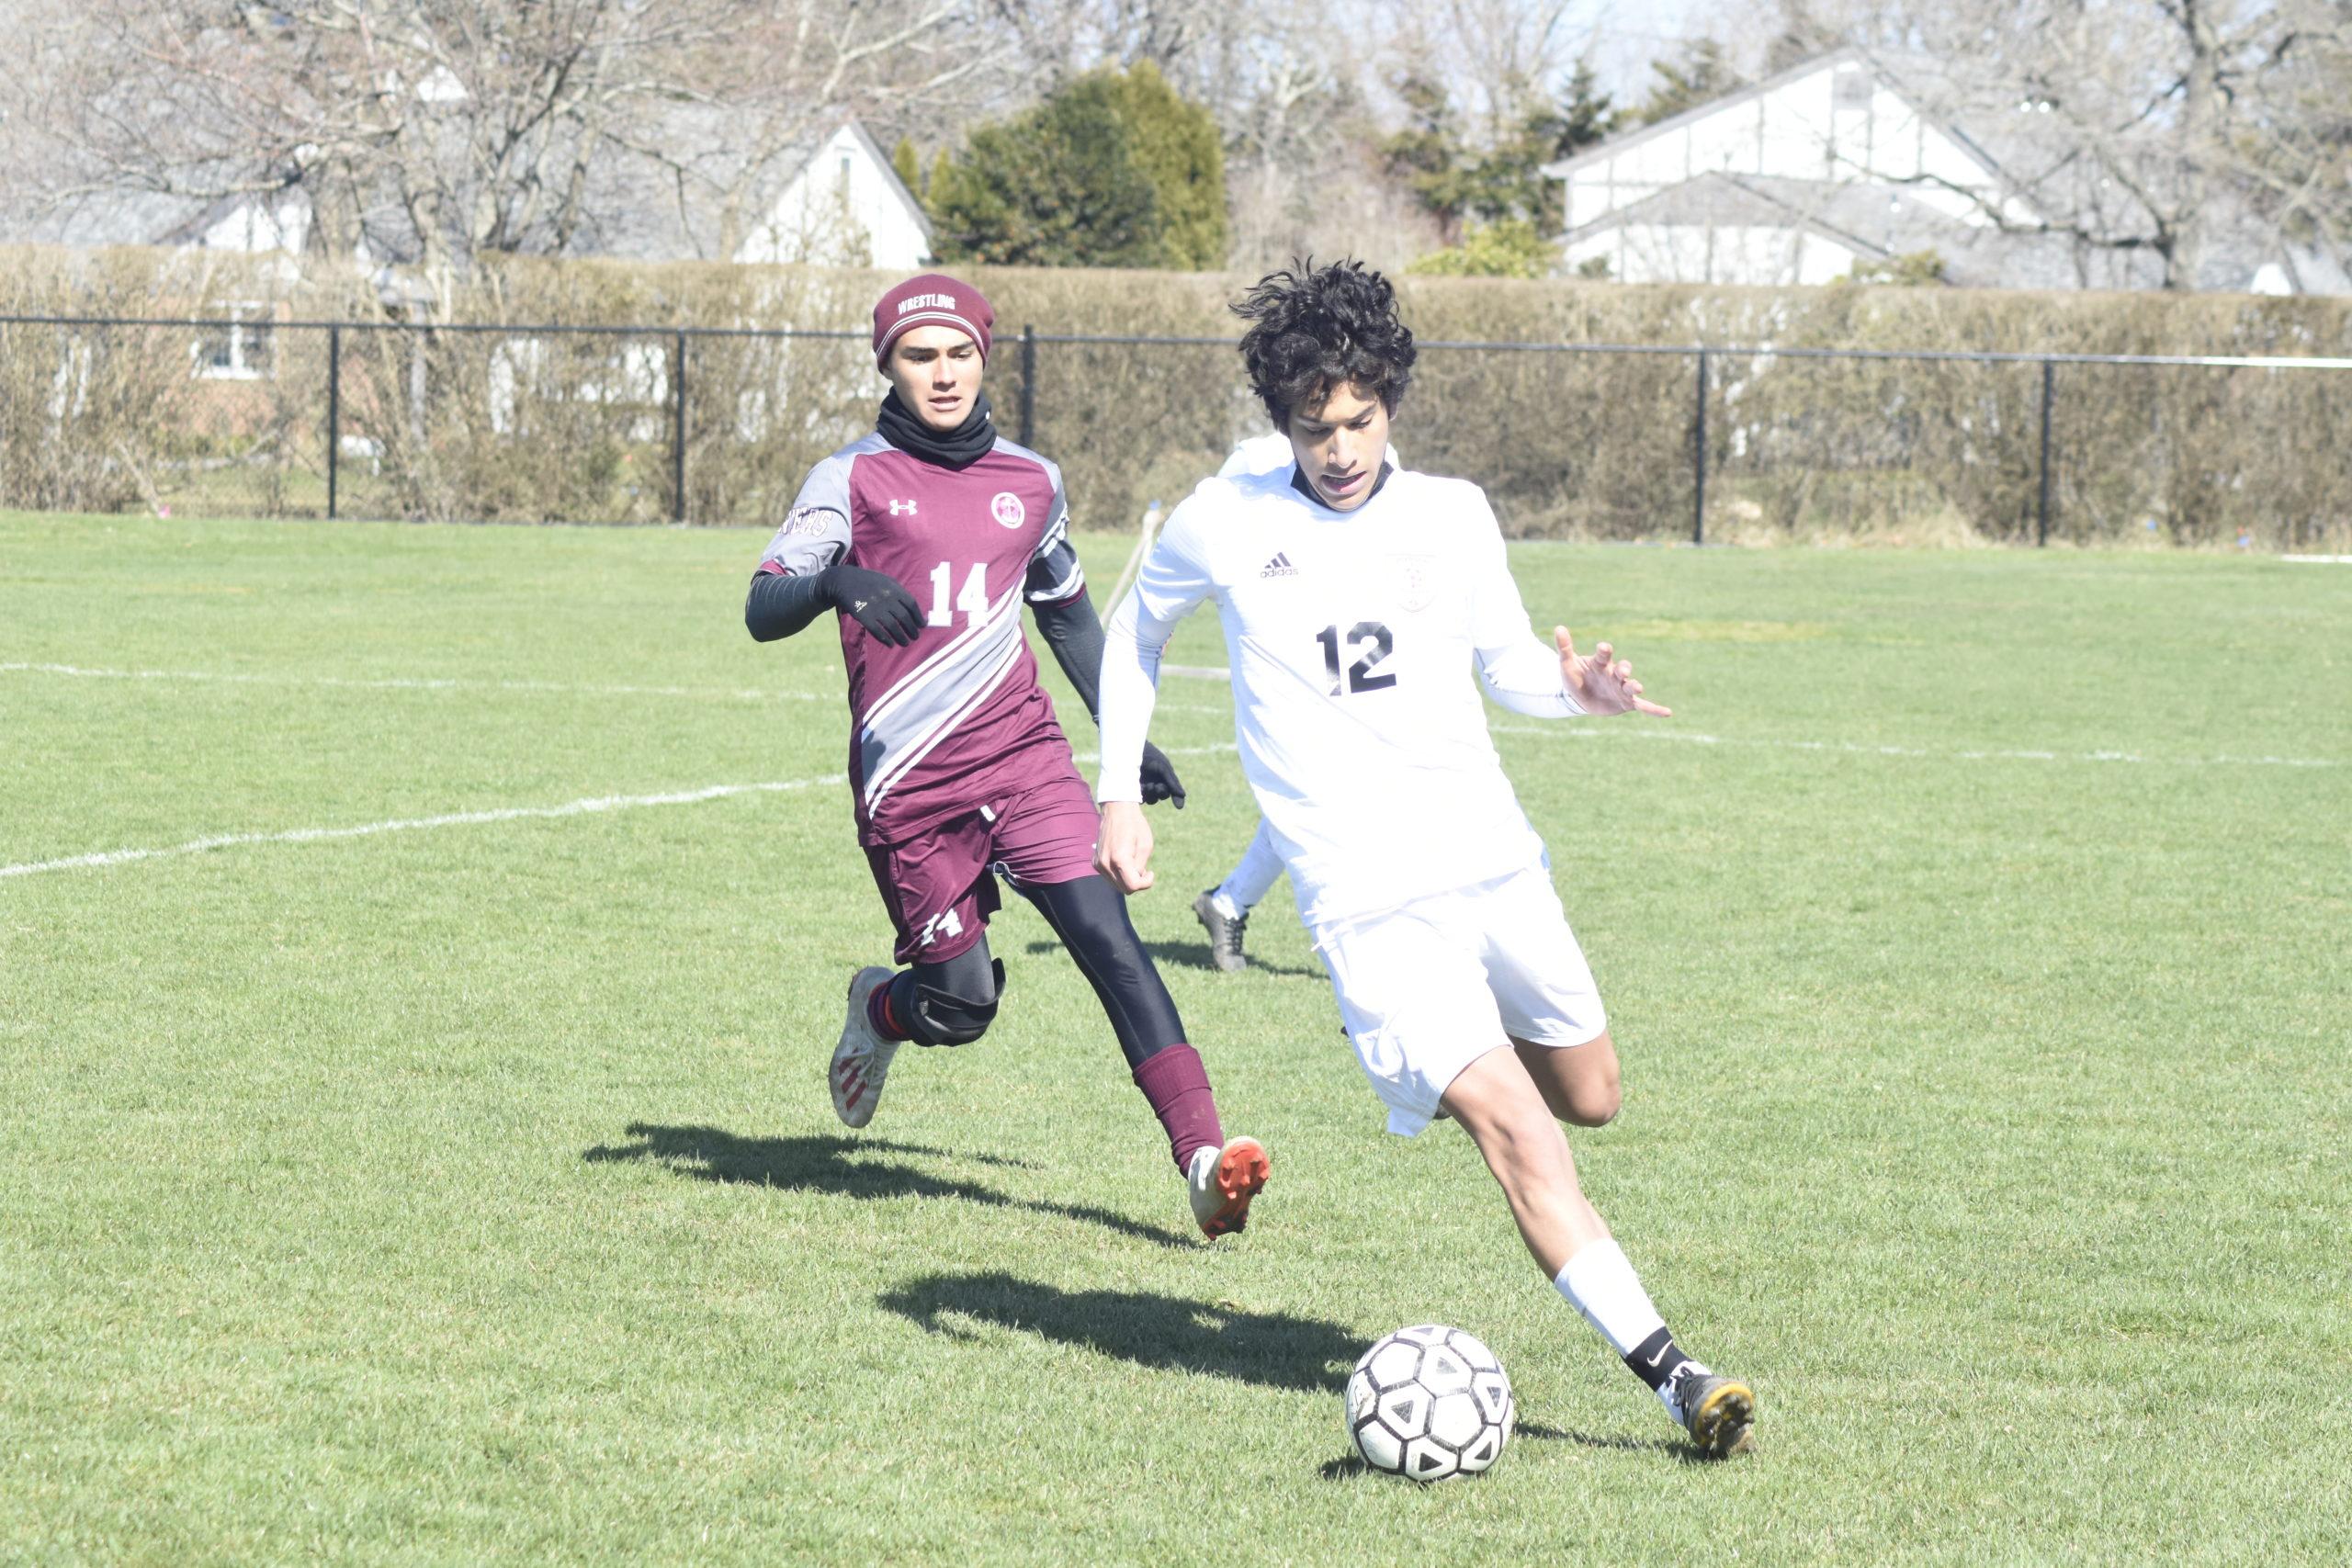 Pierson junior Daniel Martinez plays the ball near the sideline with Southampton junior Adrian Gonzalez trailing him.